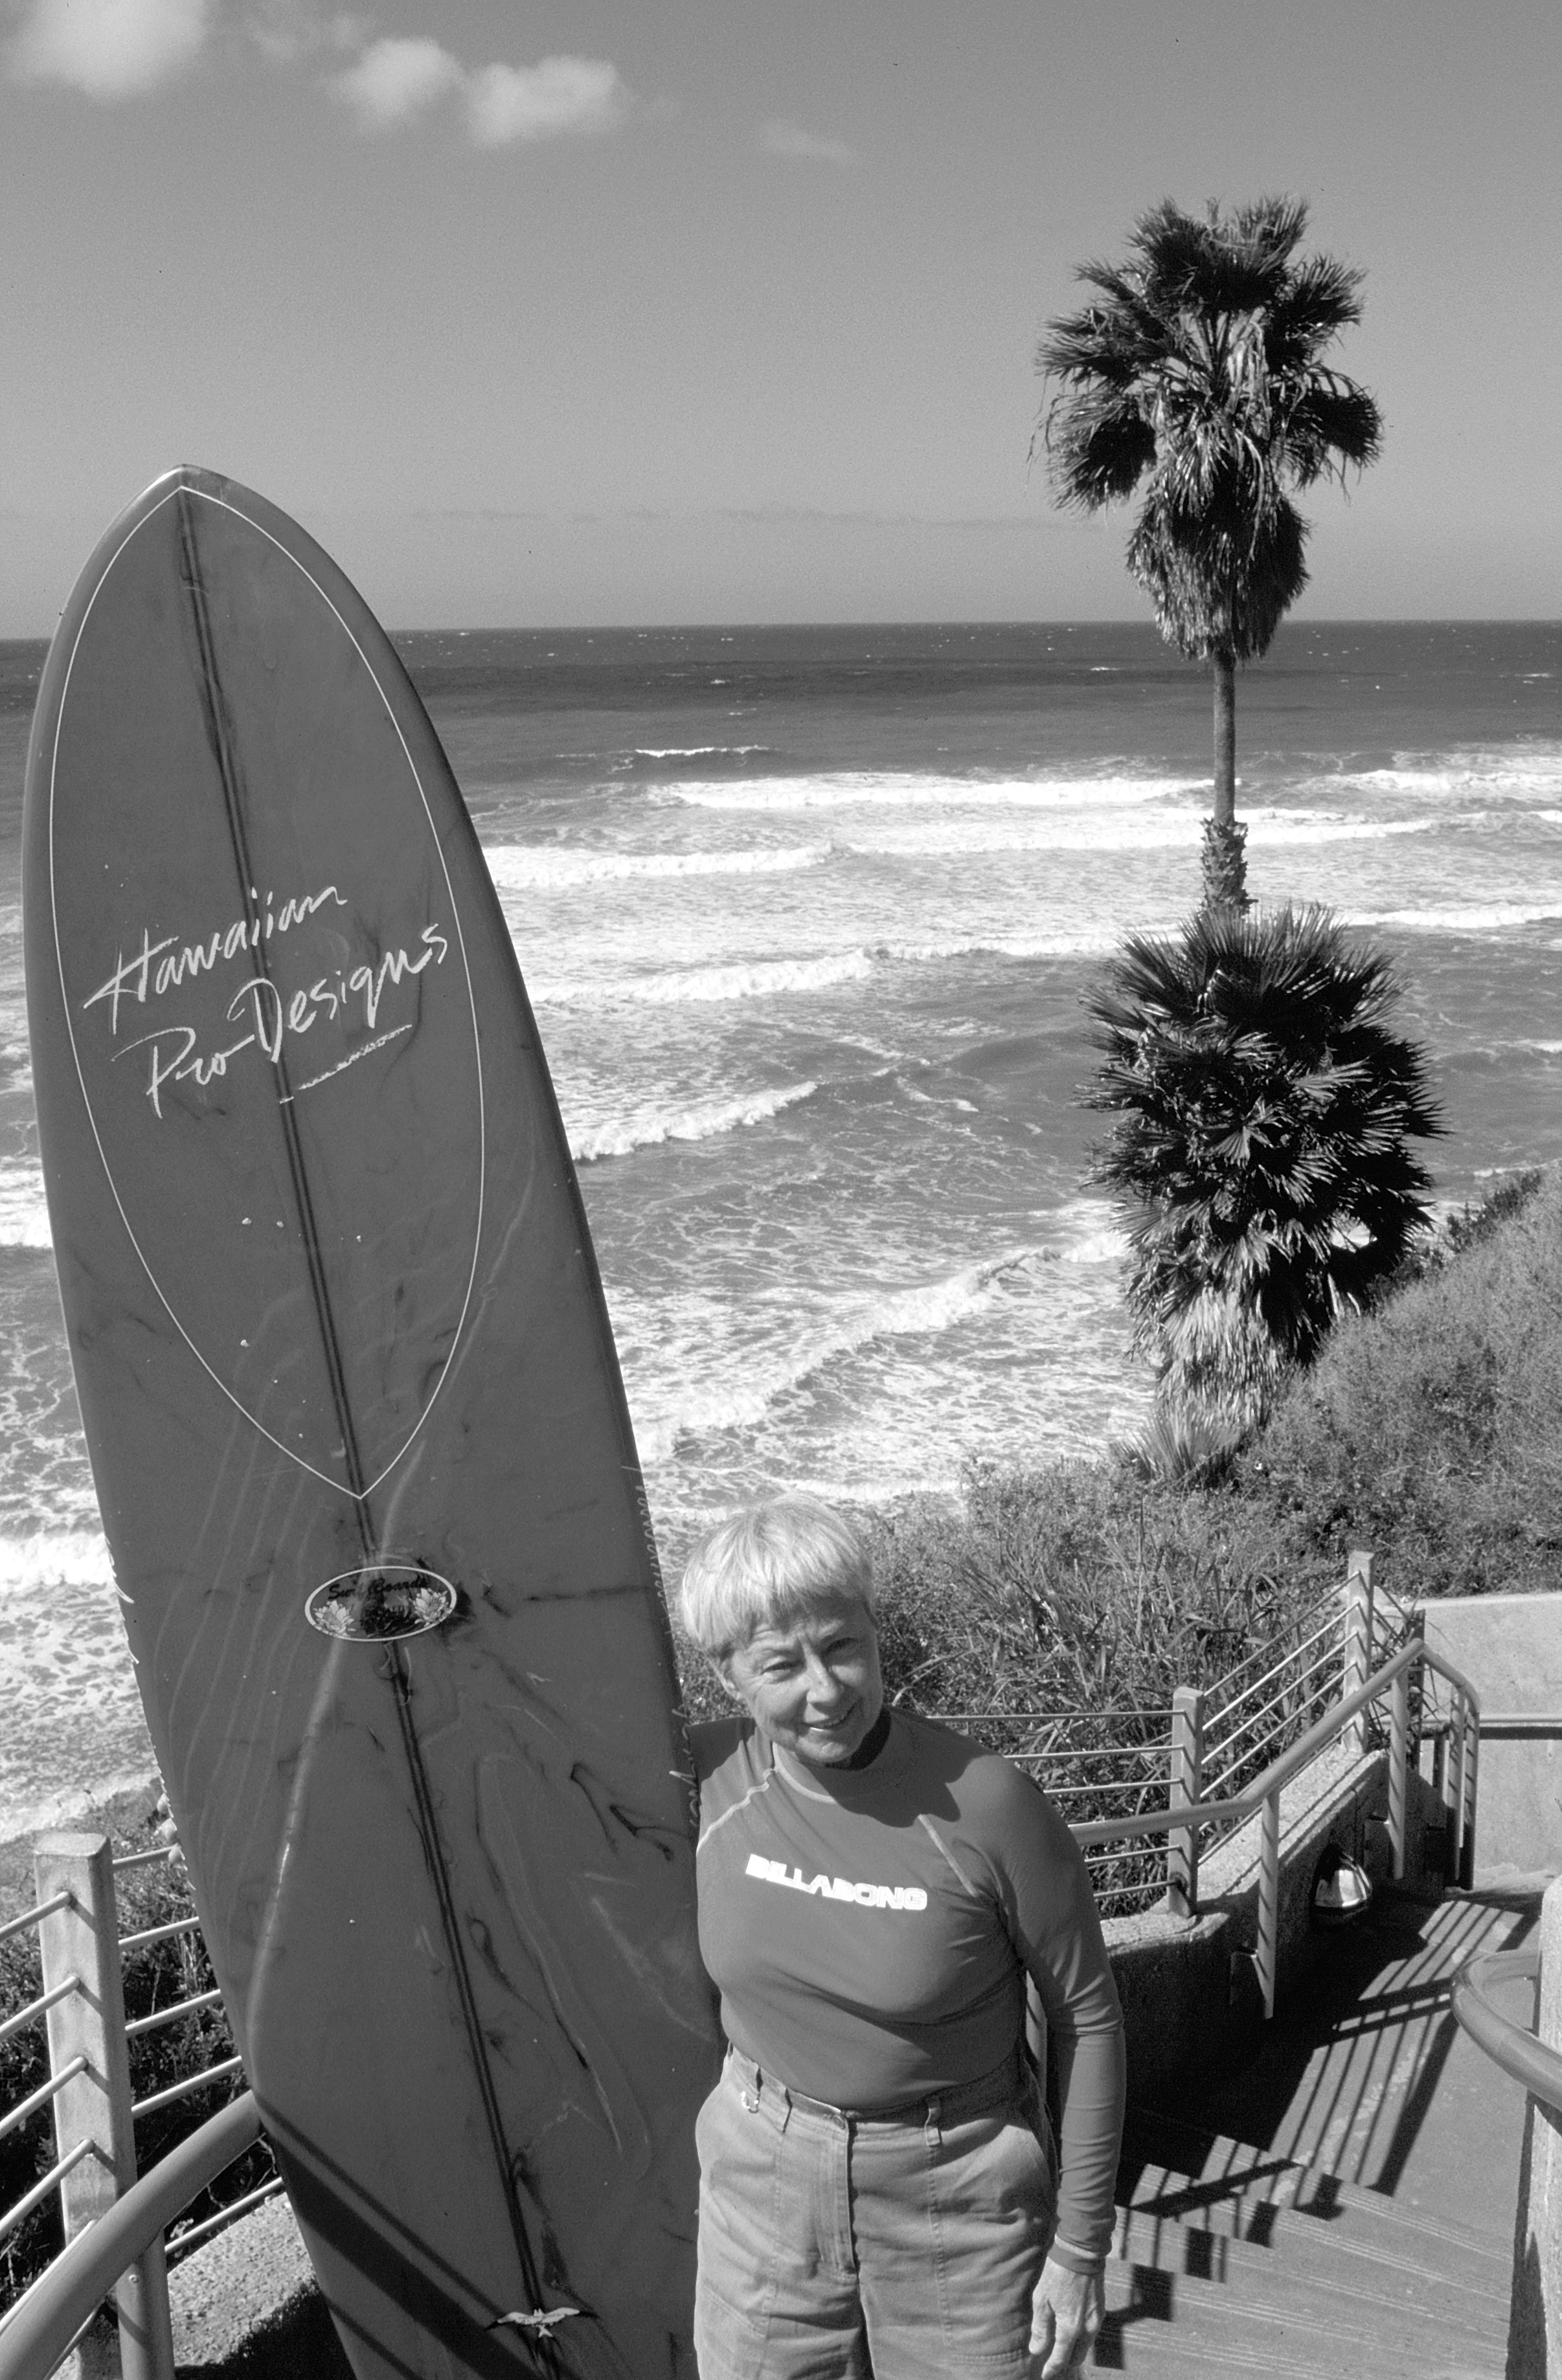 Women Evolution Surfing Surf Surfer Summer Beach Board Wave Ocean FITTED T-SHIRT